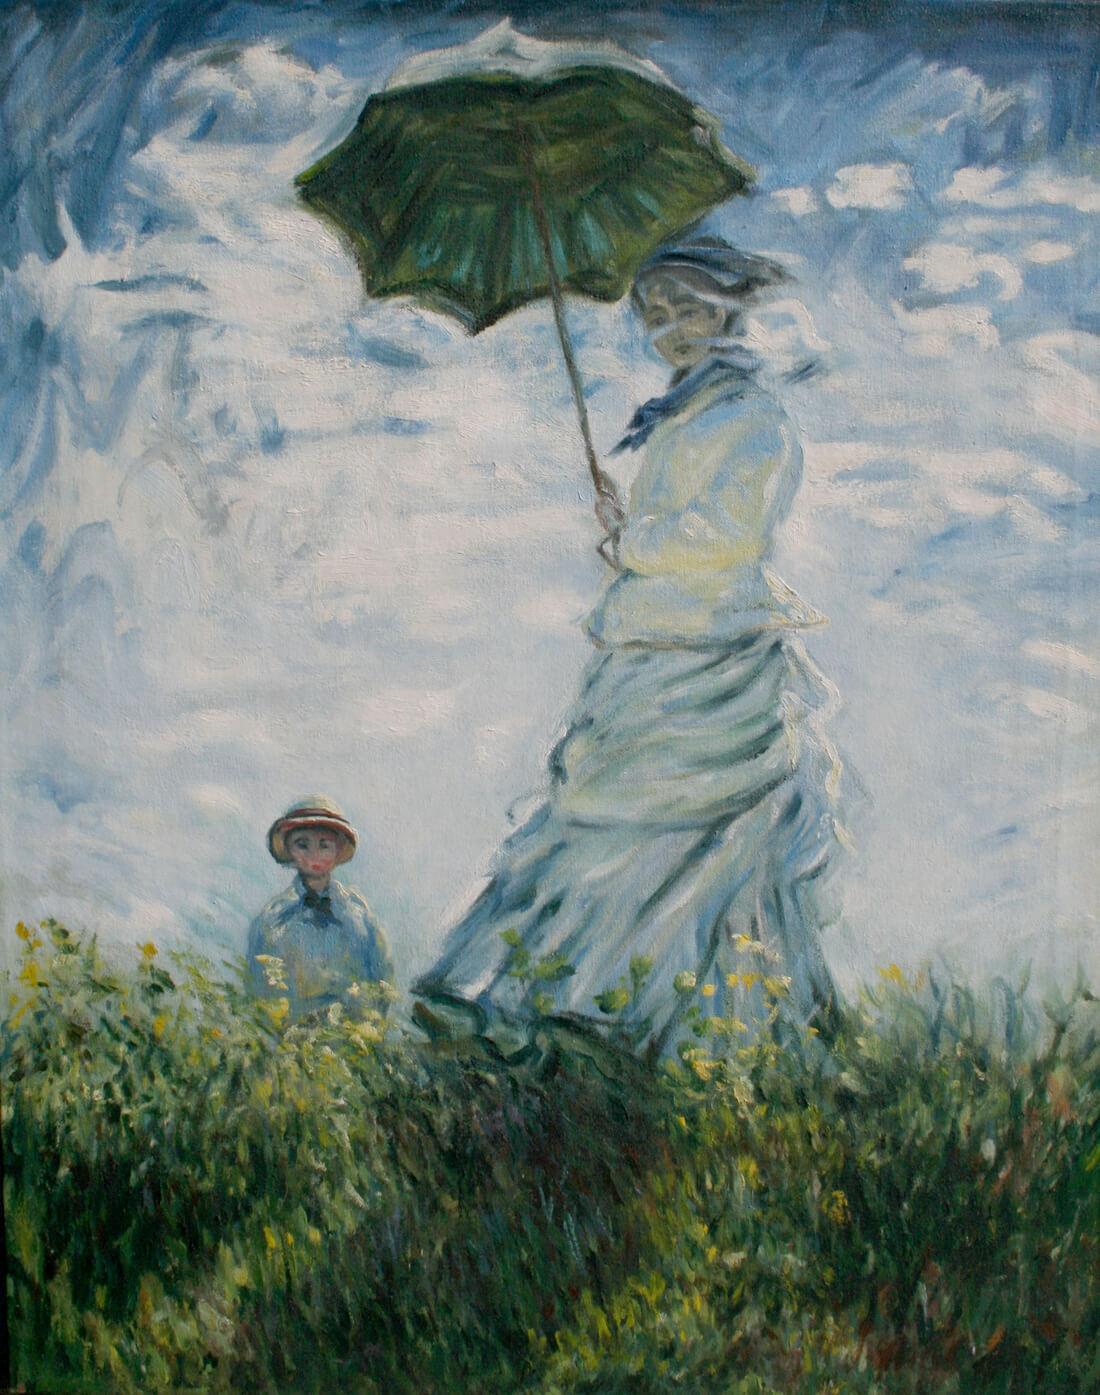 Monet reproduction, oil on canvas 24 x 36